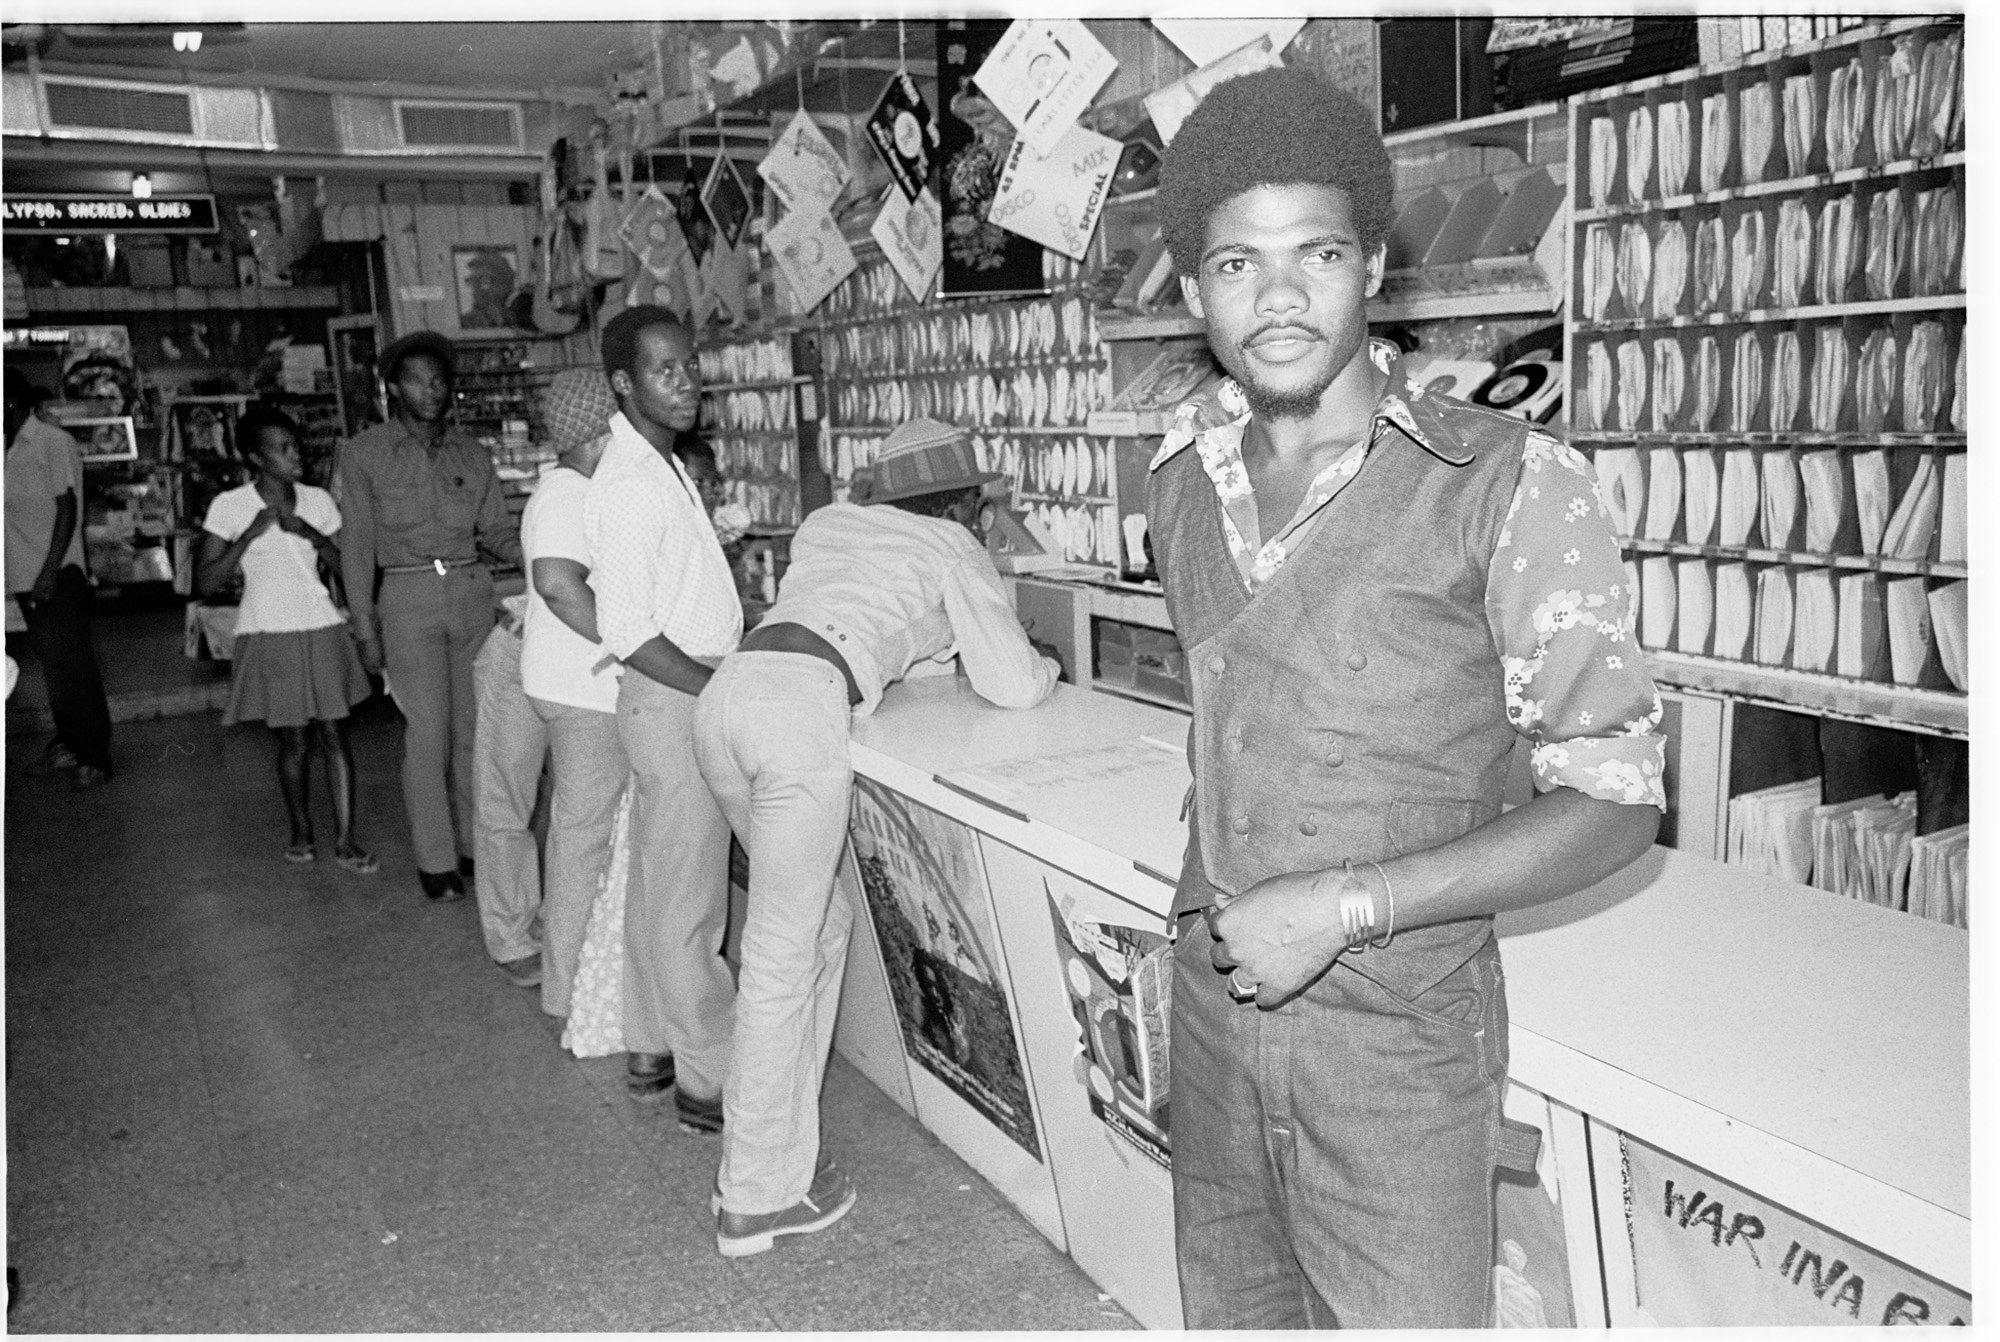 reggae essay John jeremiah sullivan ventured to kingston, jamaica, shortly after that city  burned last summer, to find reggae's most righteous survivor.